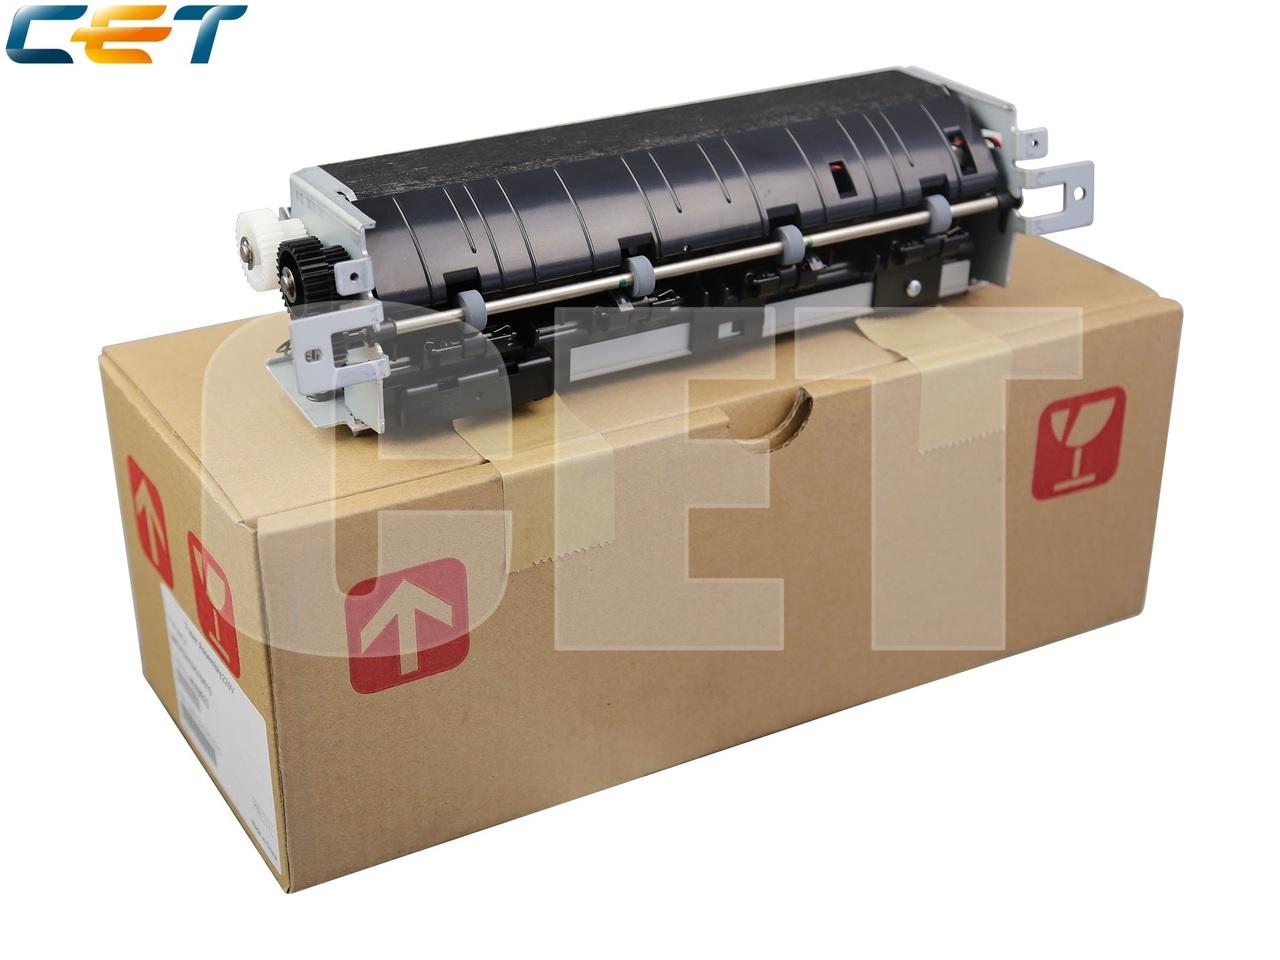 Фьюзер (печка) в сборе 40X8024 для LEXMARKMX310/MX410/MX510/MX610/MS310/MS410/MS510/MS610(CET), CET2841